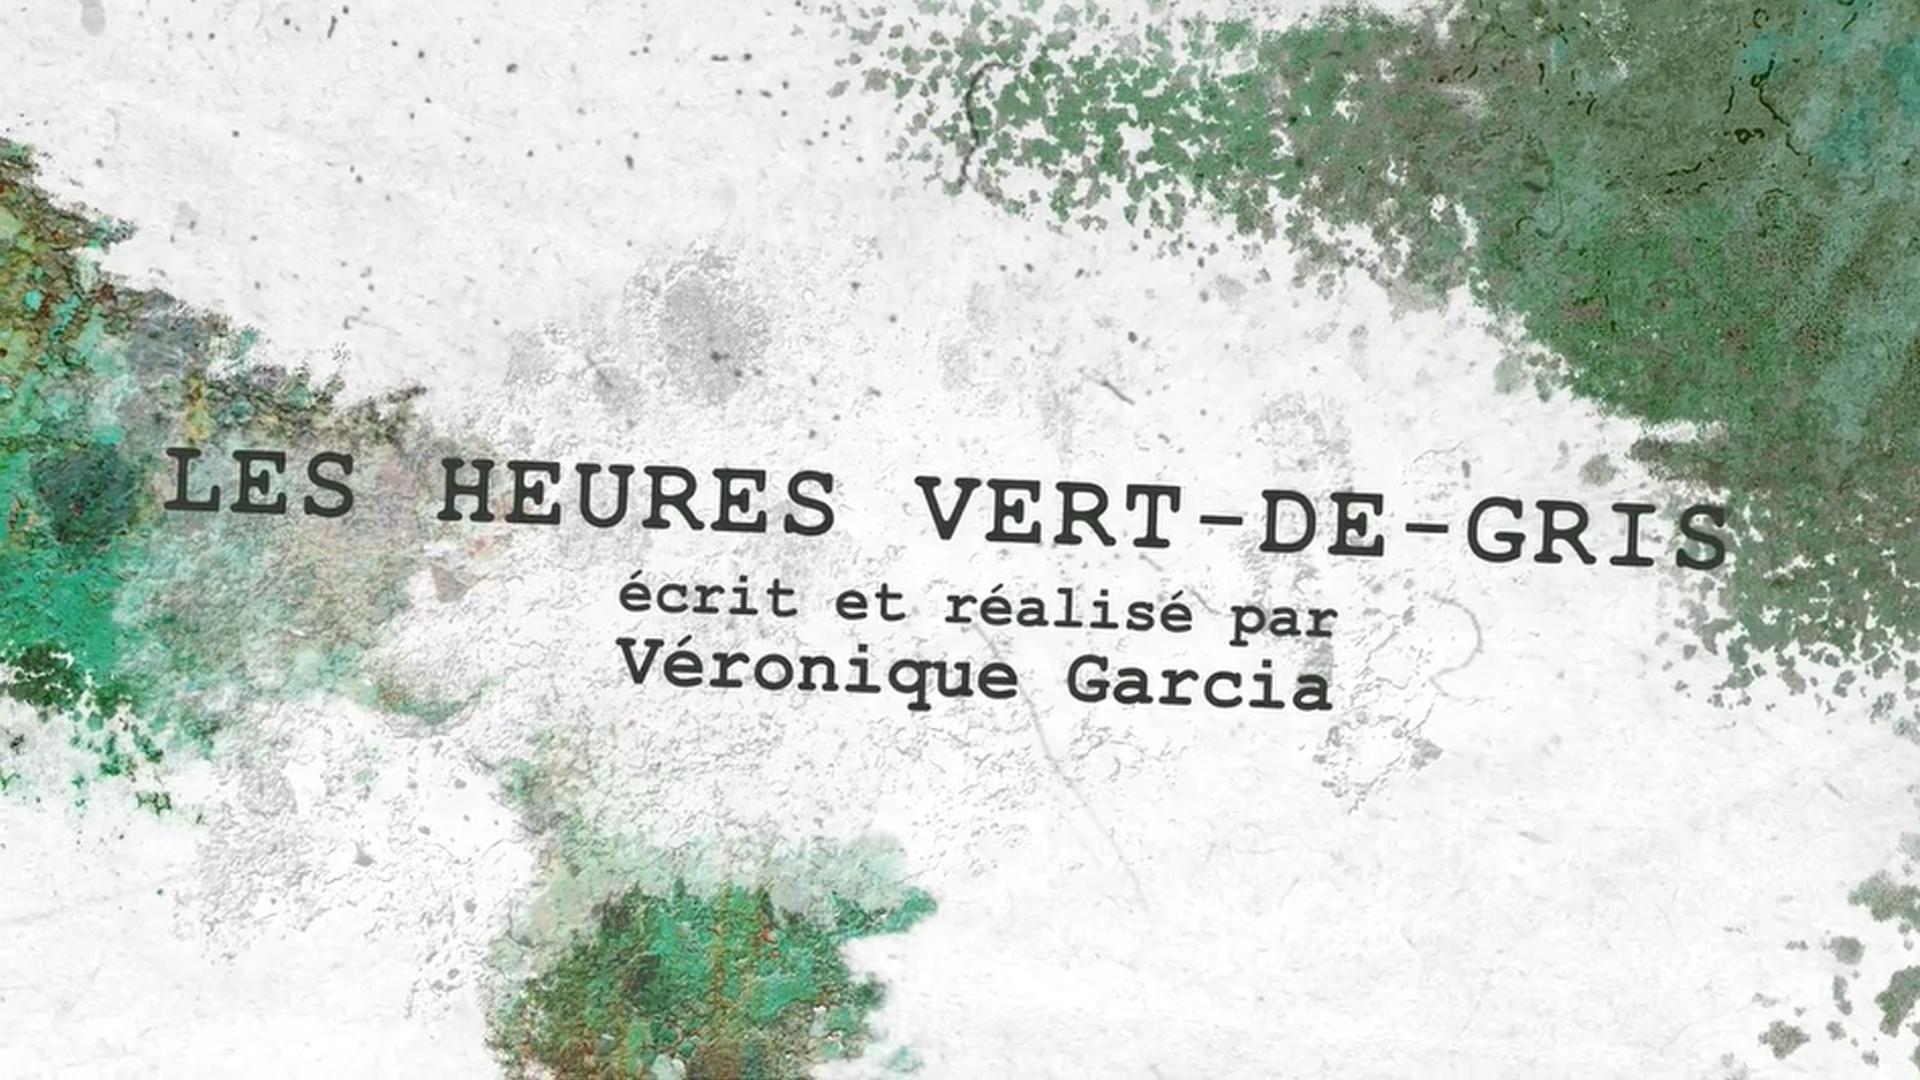 Les heures vert-de-gris - Documentaire 52'